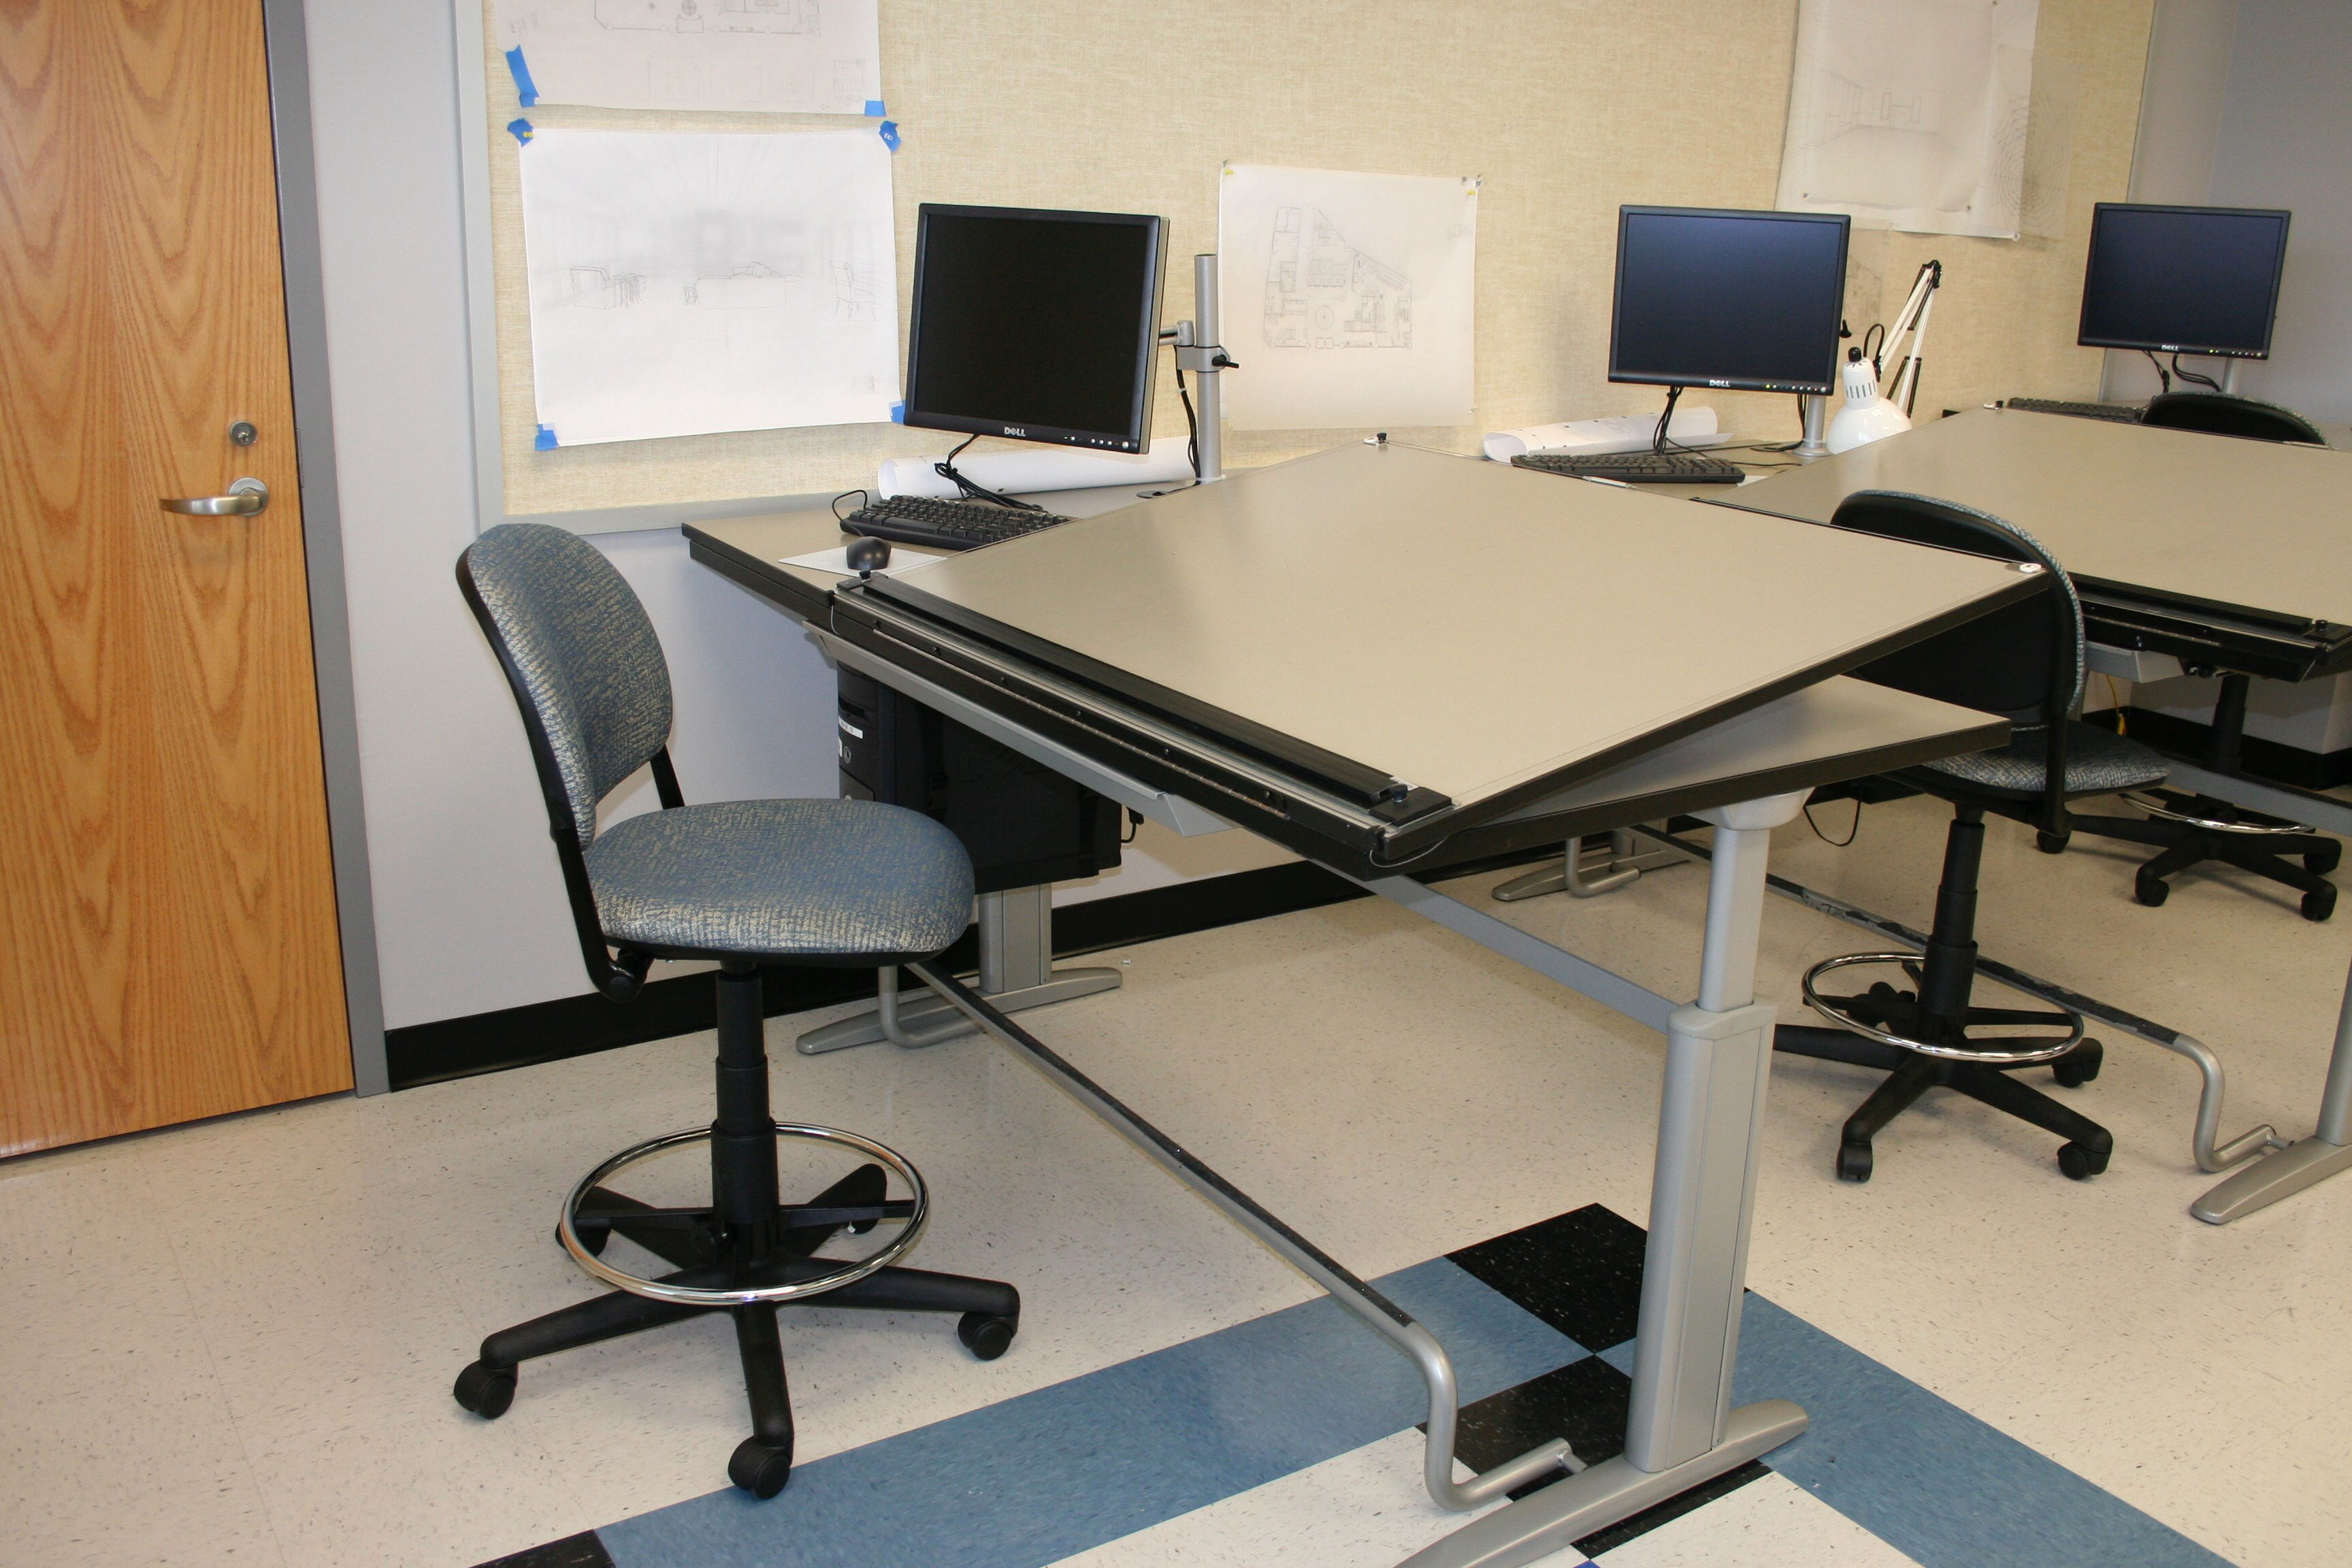 KI Drafting Table, Adjustable Height.